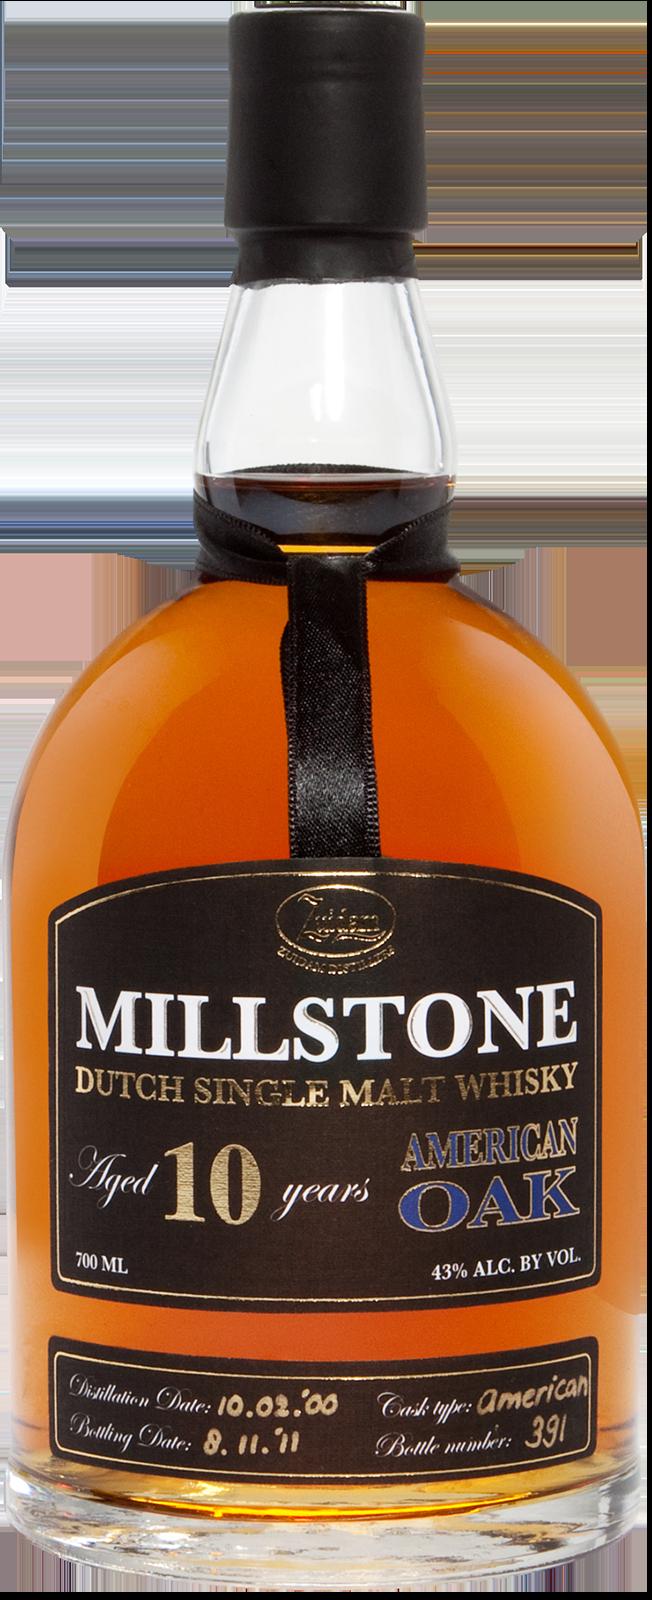 NV-Millstone Dutch Whisky 10 Years American Oak